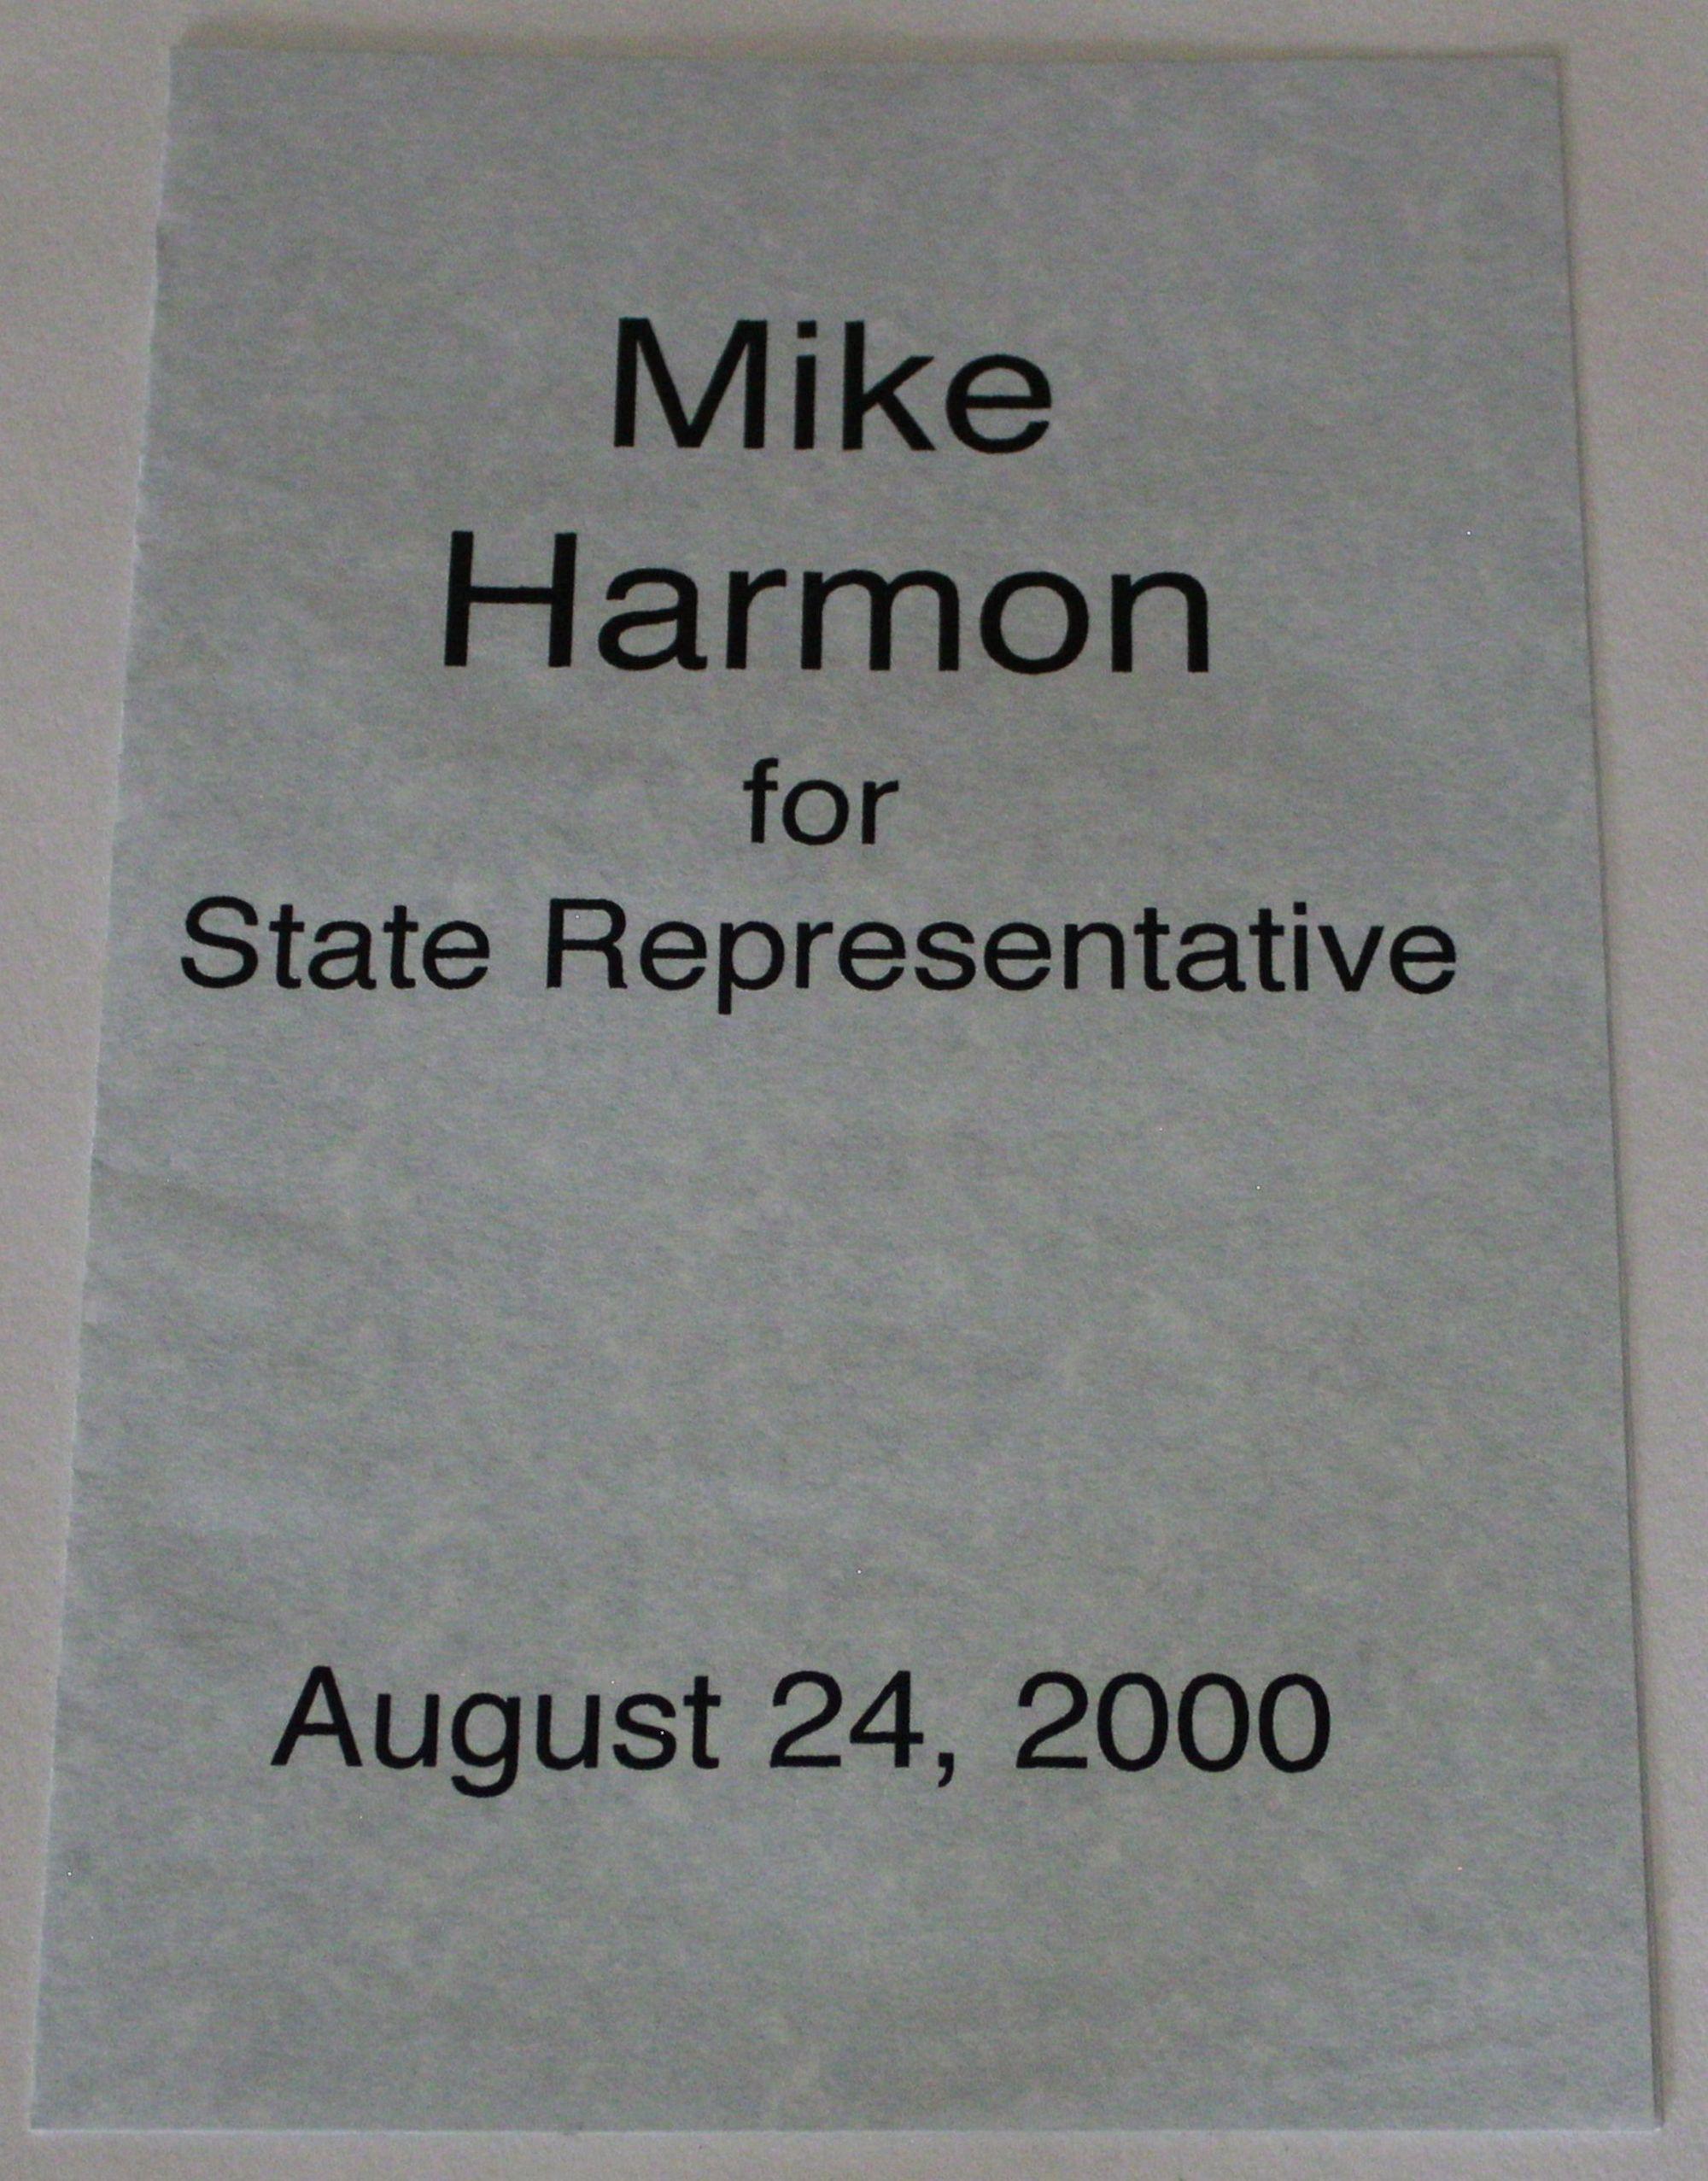 Mike Harmon, Boyle County